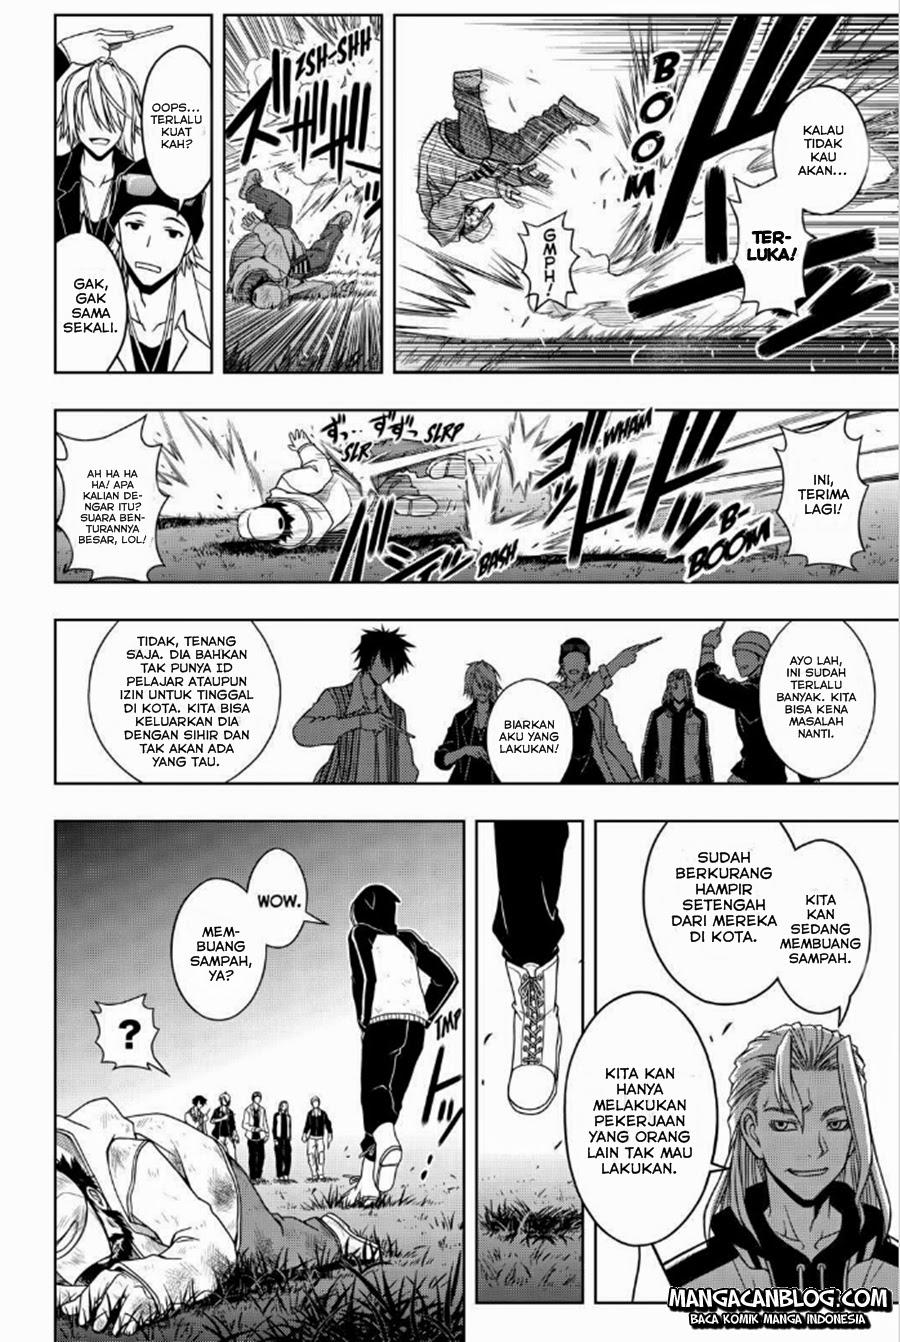 Komik uq holder 046 - the psion 47 Indonesia uq holder 046 - the psion Terbaru 6|Baca Manga Komik Indonesia